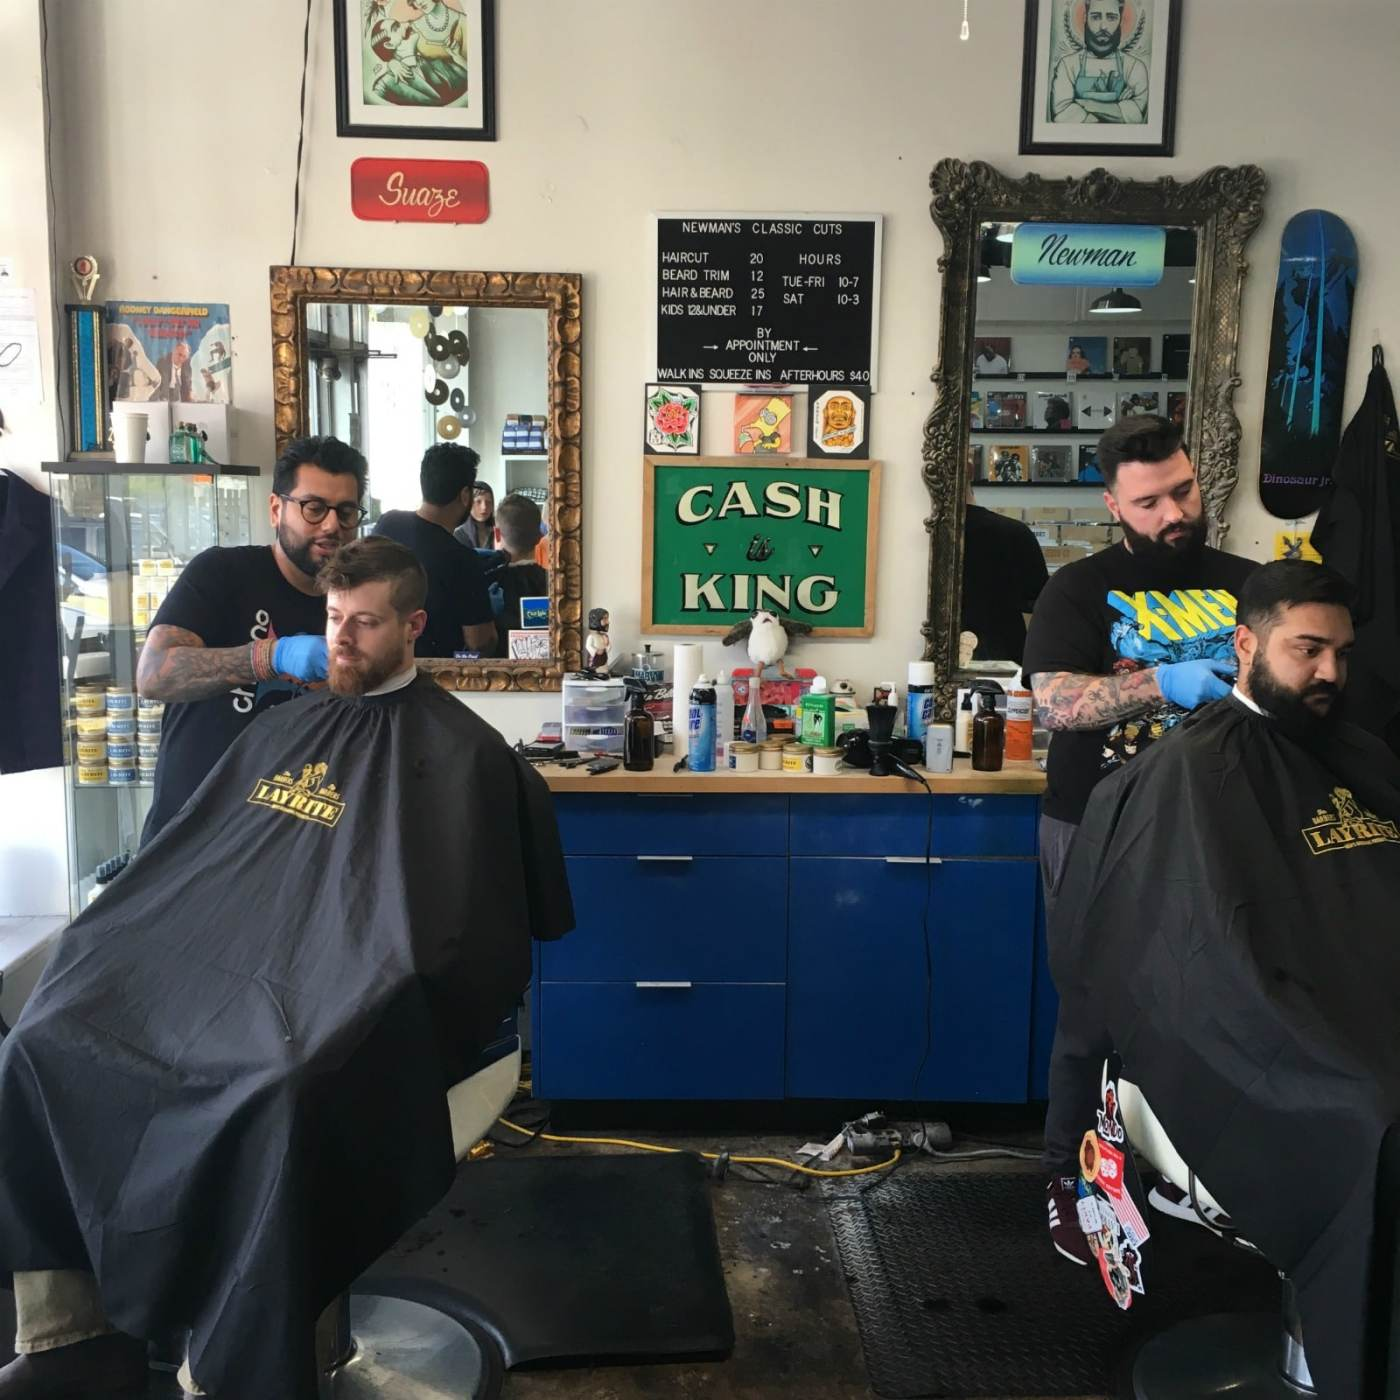 Newman's Classic Cuts is one of 5 Birmingham barbershops